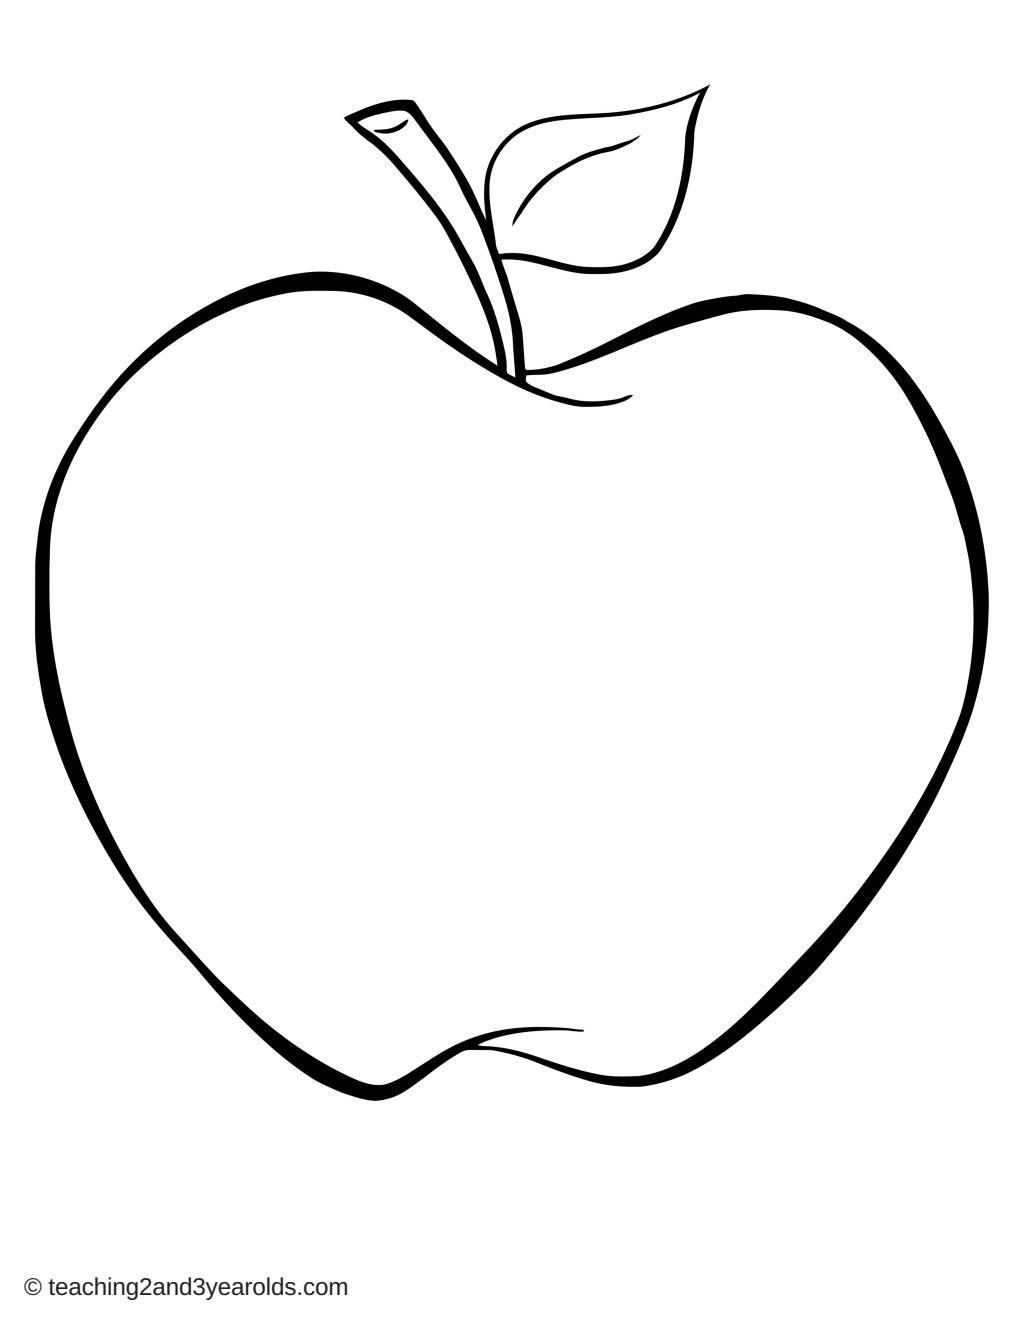 Apple Outline Printable Single Pdf Google Drive Apple Outline Outline Parchment Crafts